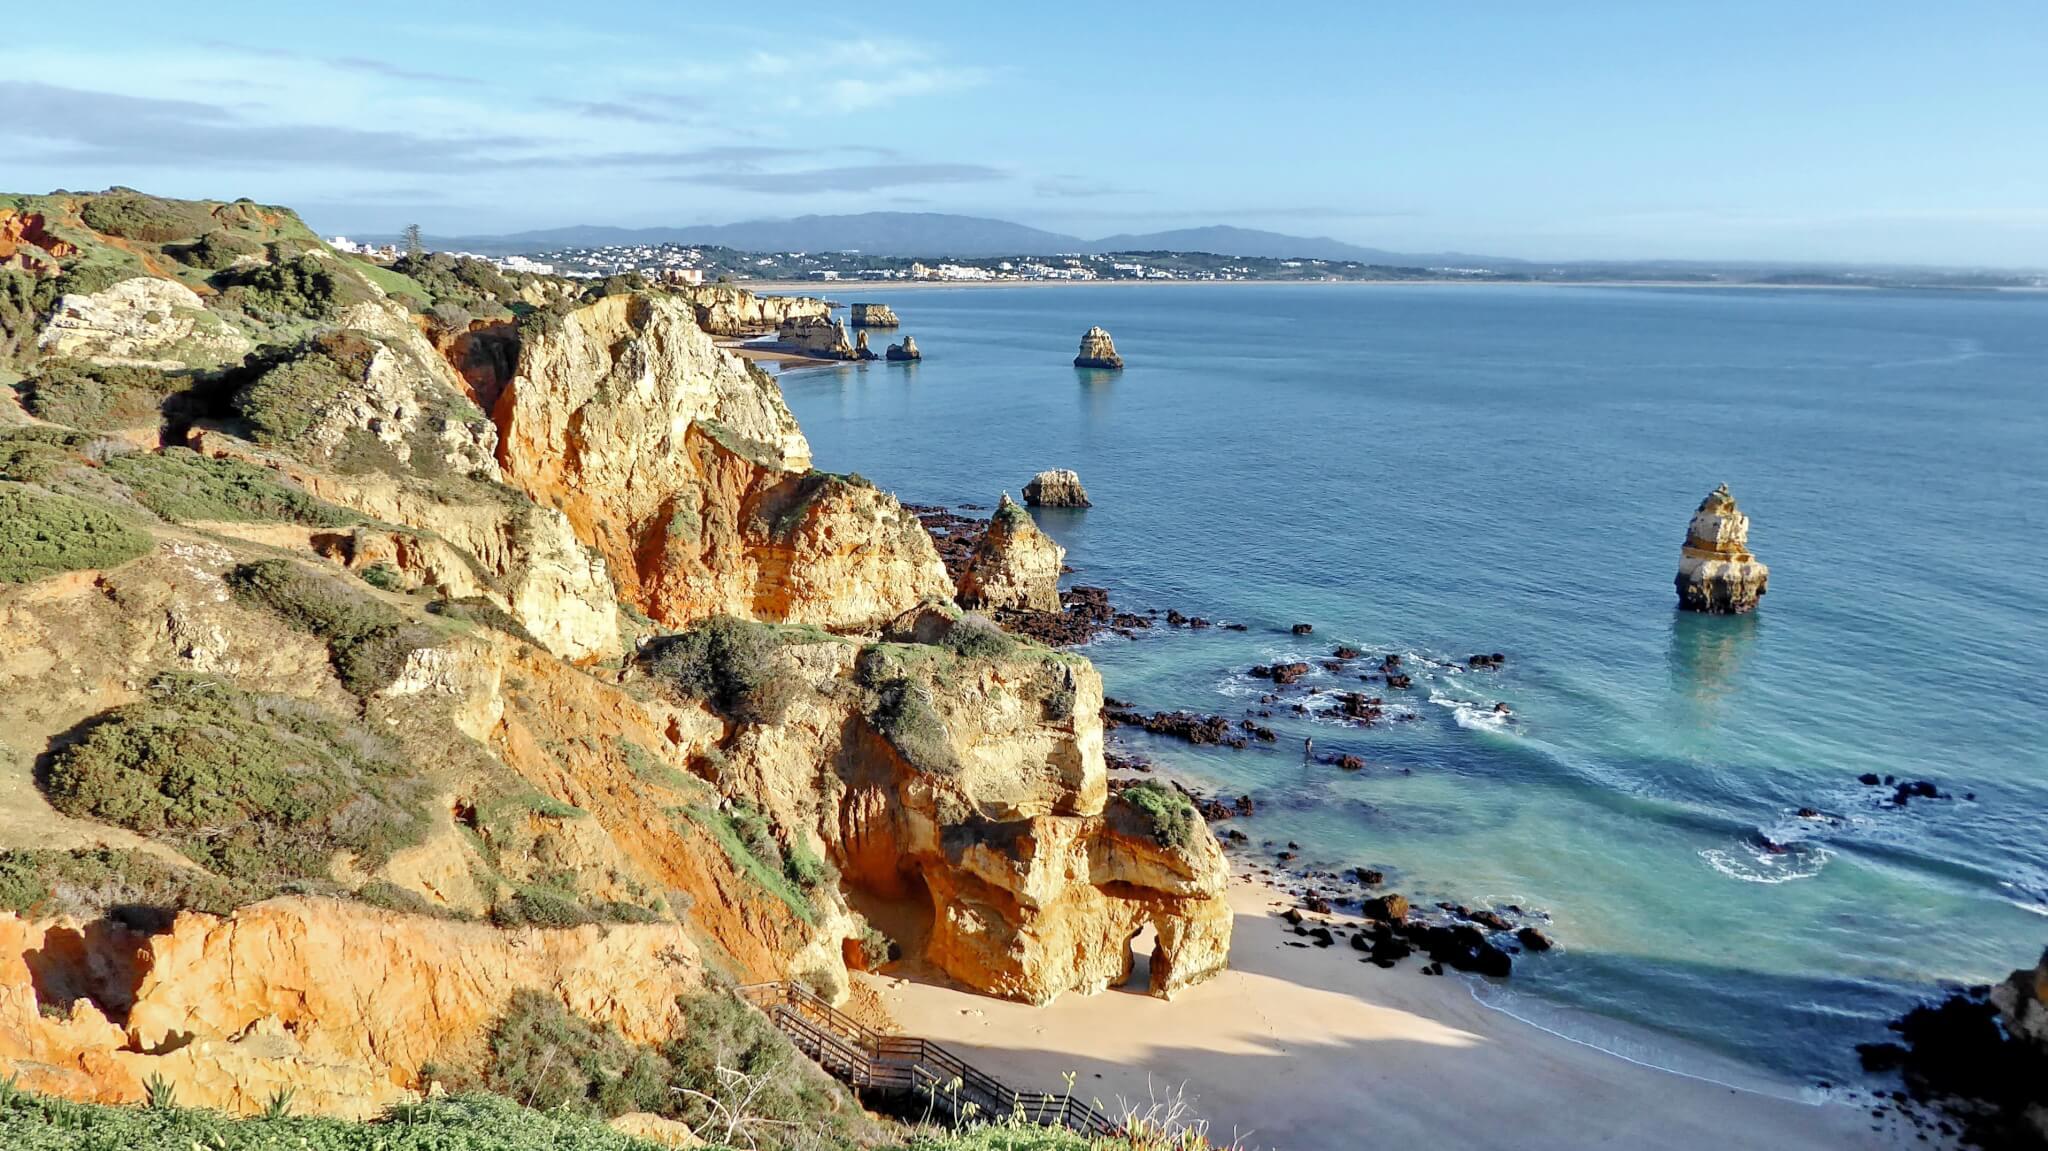 Galaxy Travel - Algarve - DAG 7